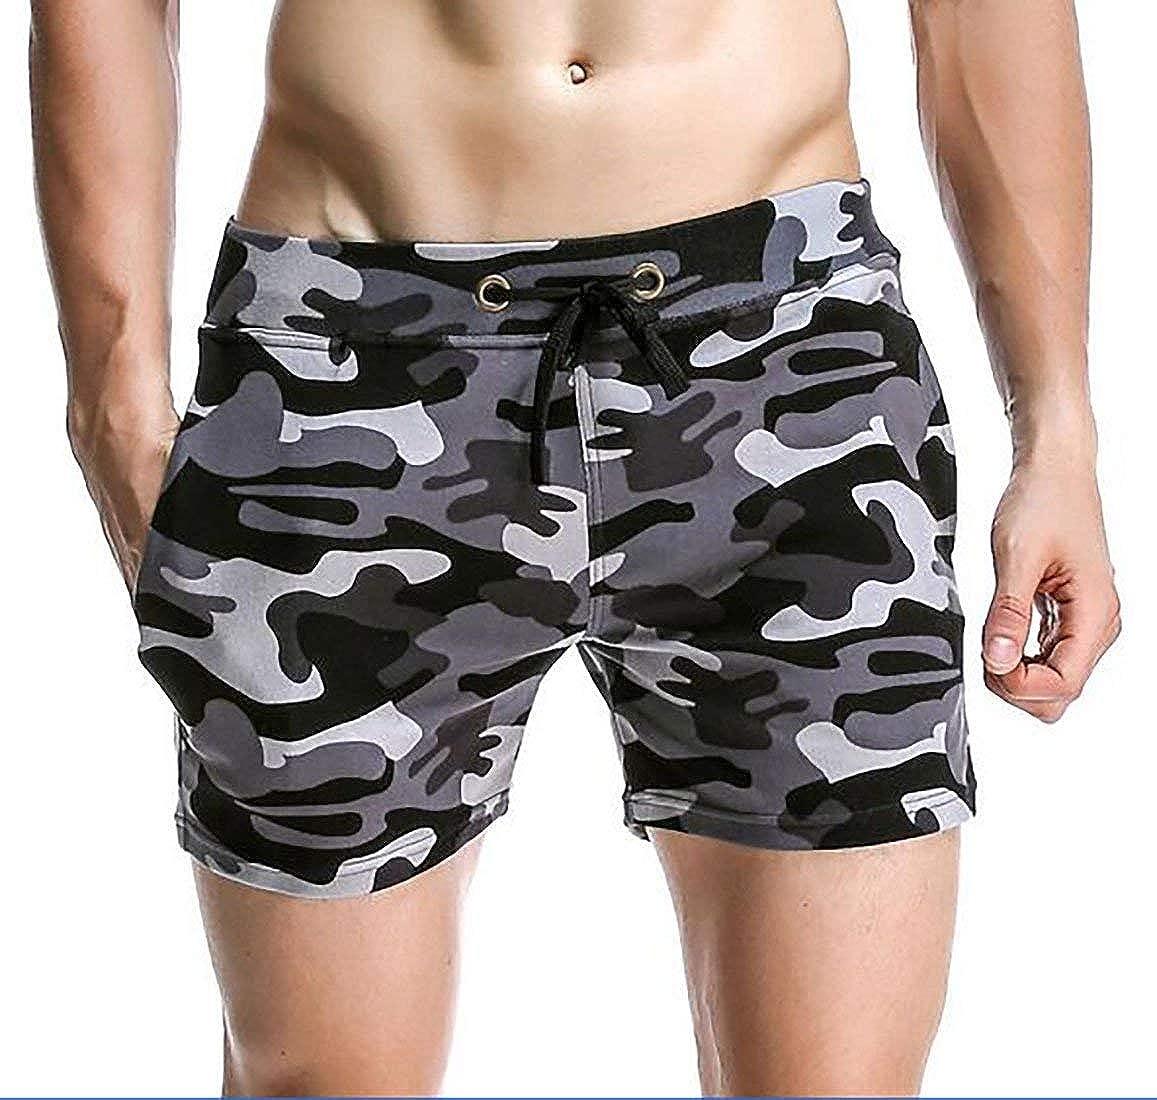 SELX-Men Fitness Camouflage Shorts Underwear Sleep Comfort Lounge Shorts